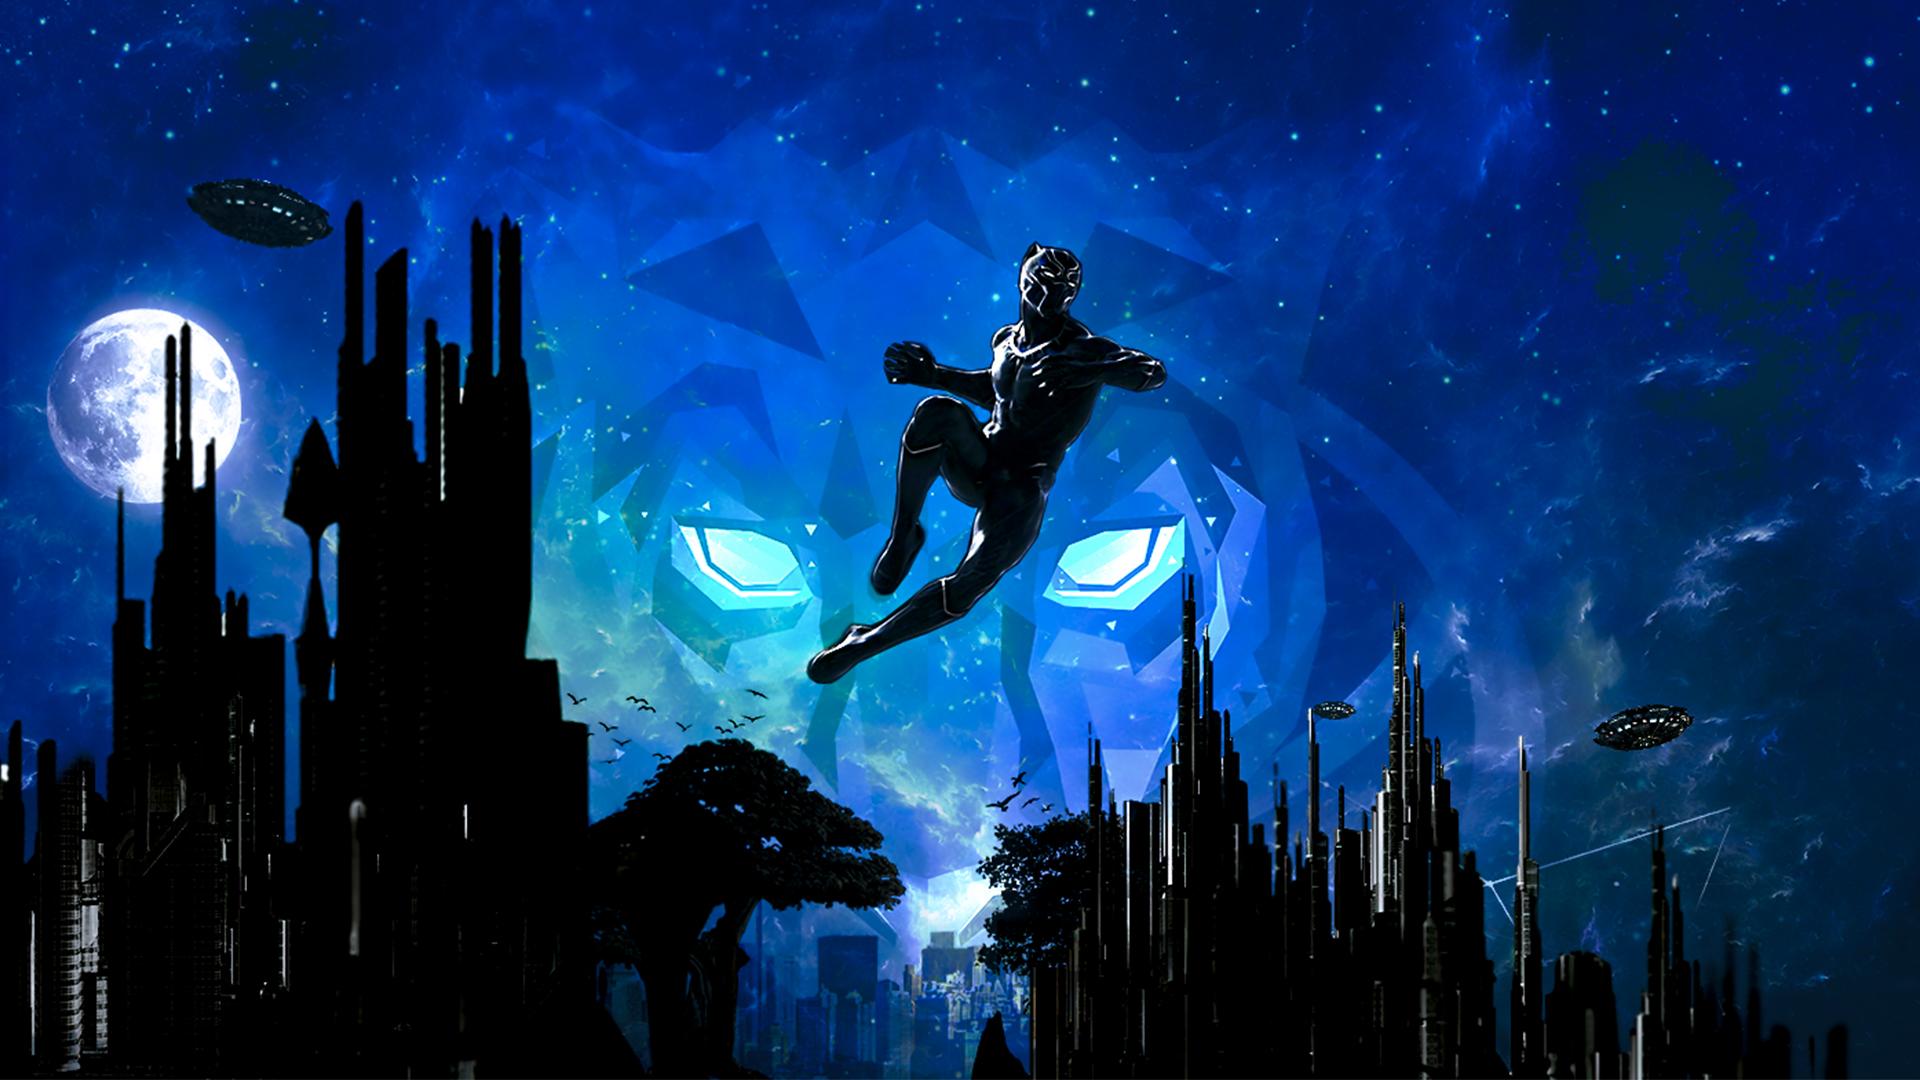 1920x1080 Black Panther Marvel Cinematic Universe Artwork